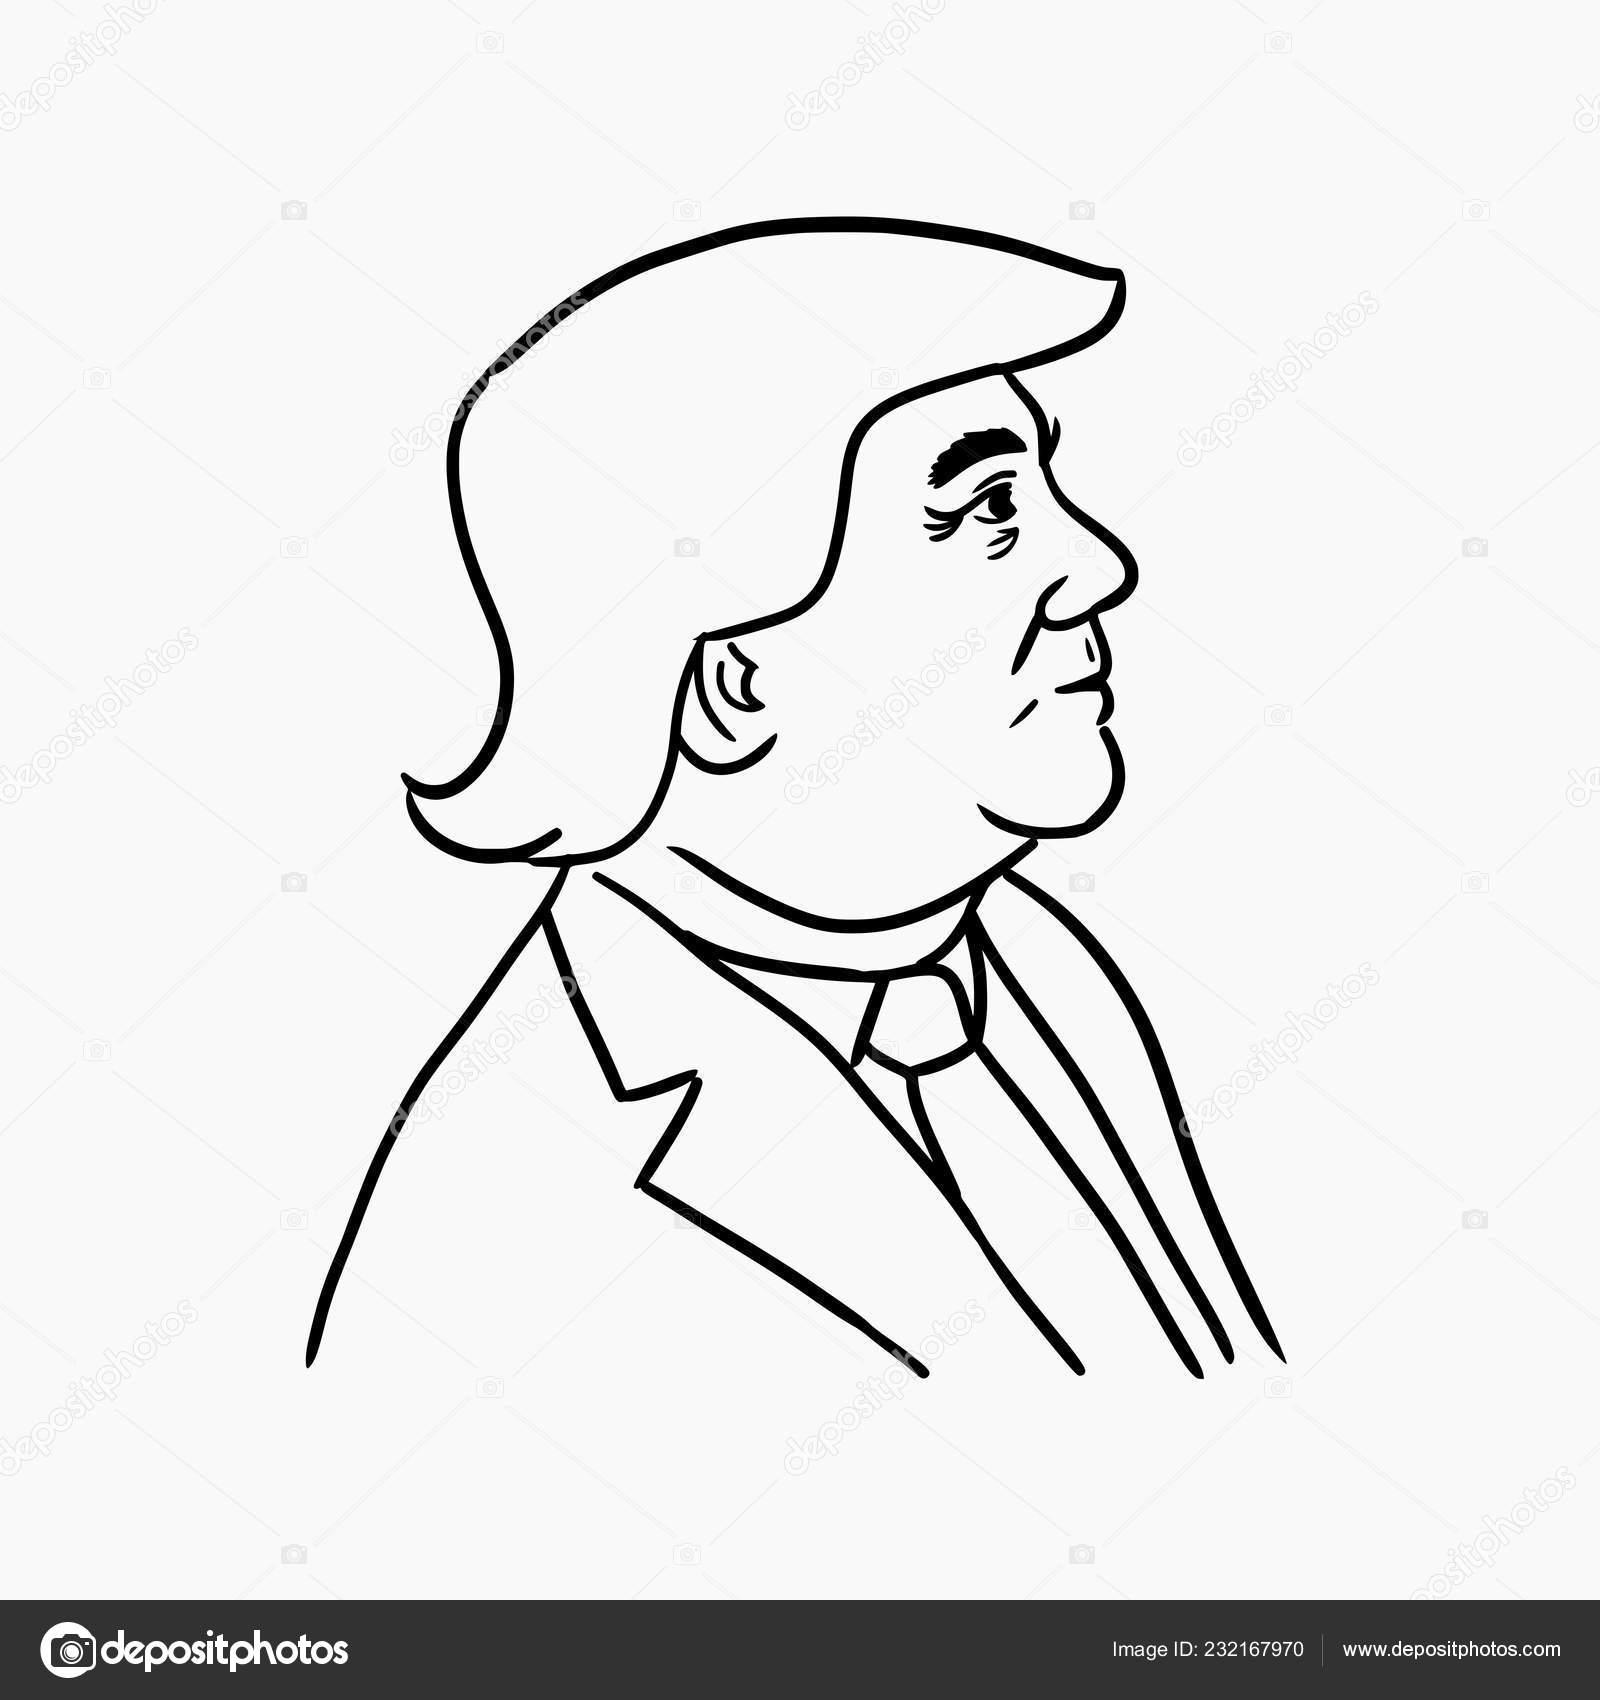 Hand Drawn Cartoon Style Illustration 45th Current President